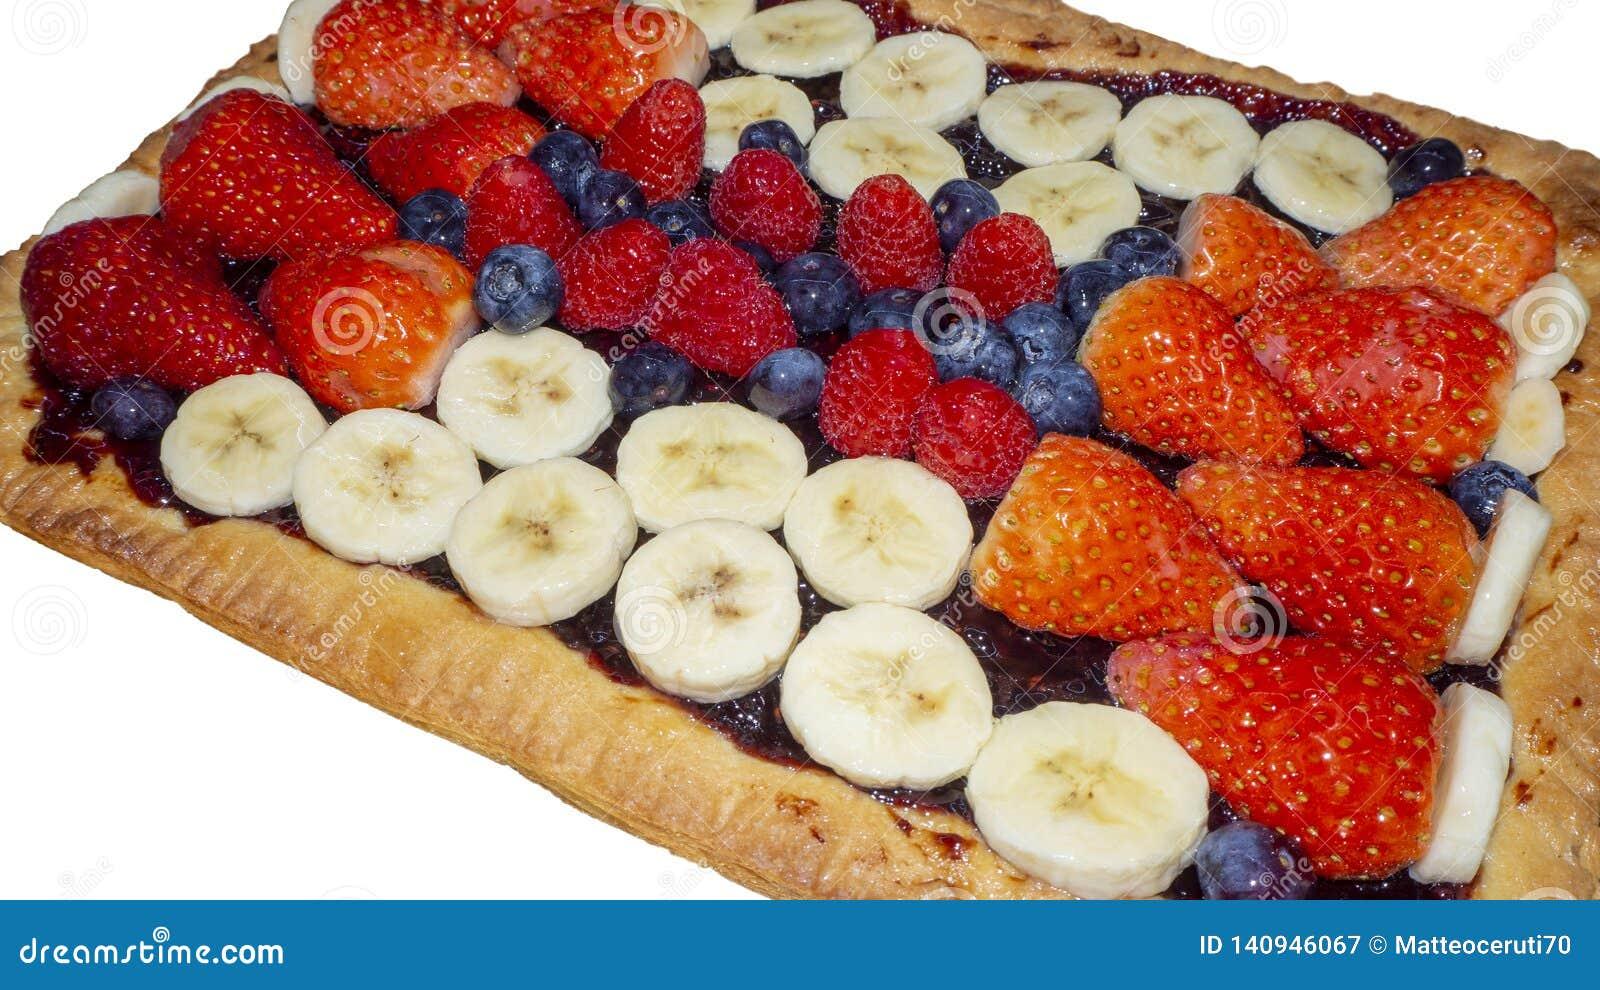 Homemade tart with fresh fruit, strawberries, bananas, blueberries and raspberries